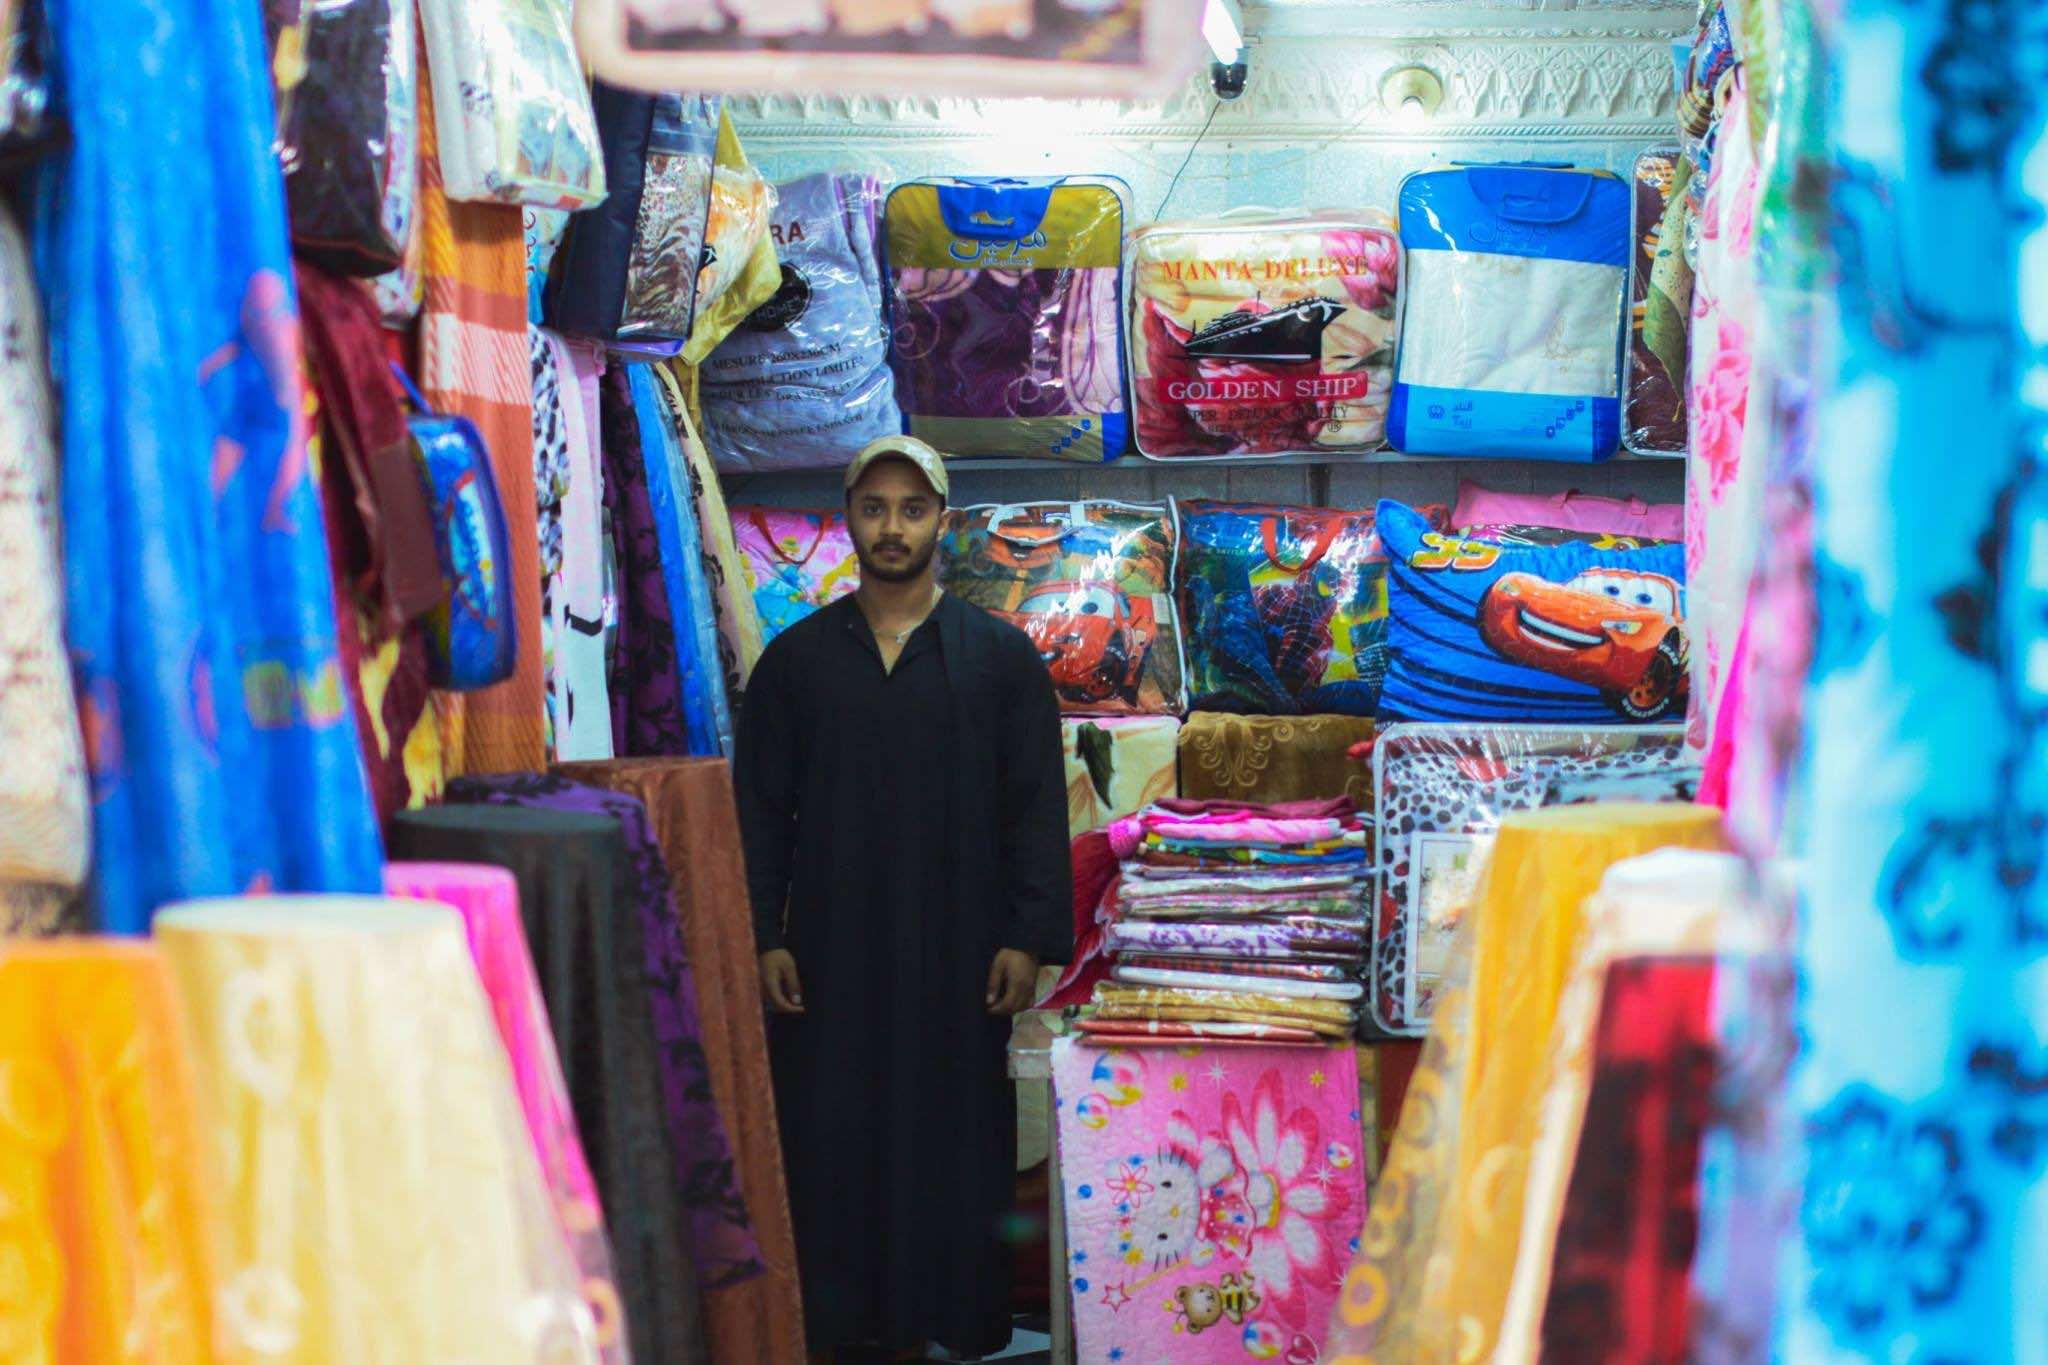 Inside the Walls of Old Medinas- Shop owner in Rabat